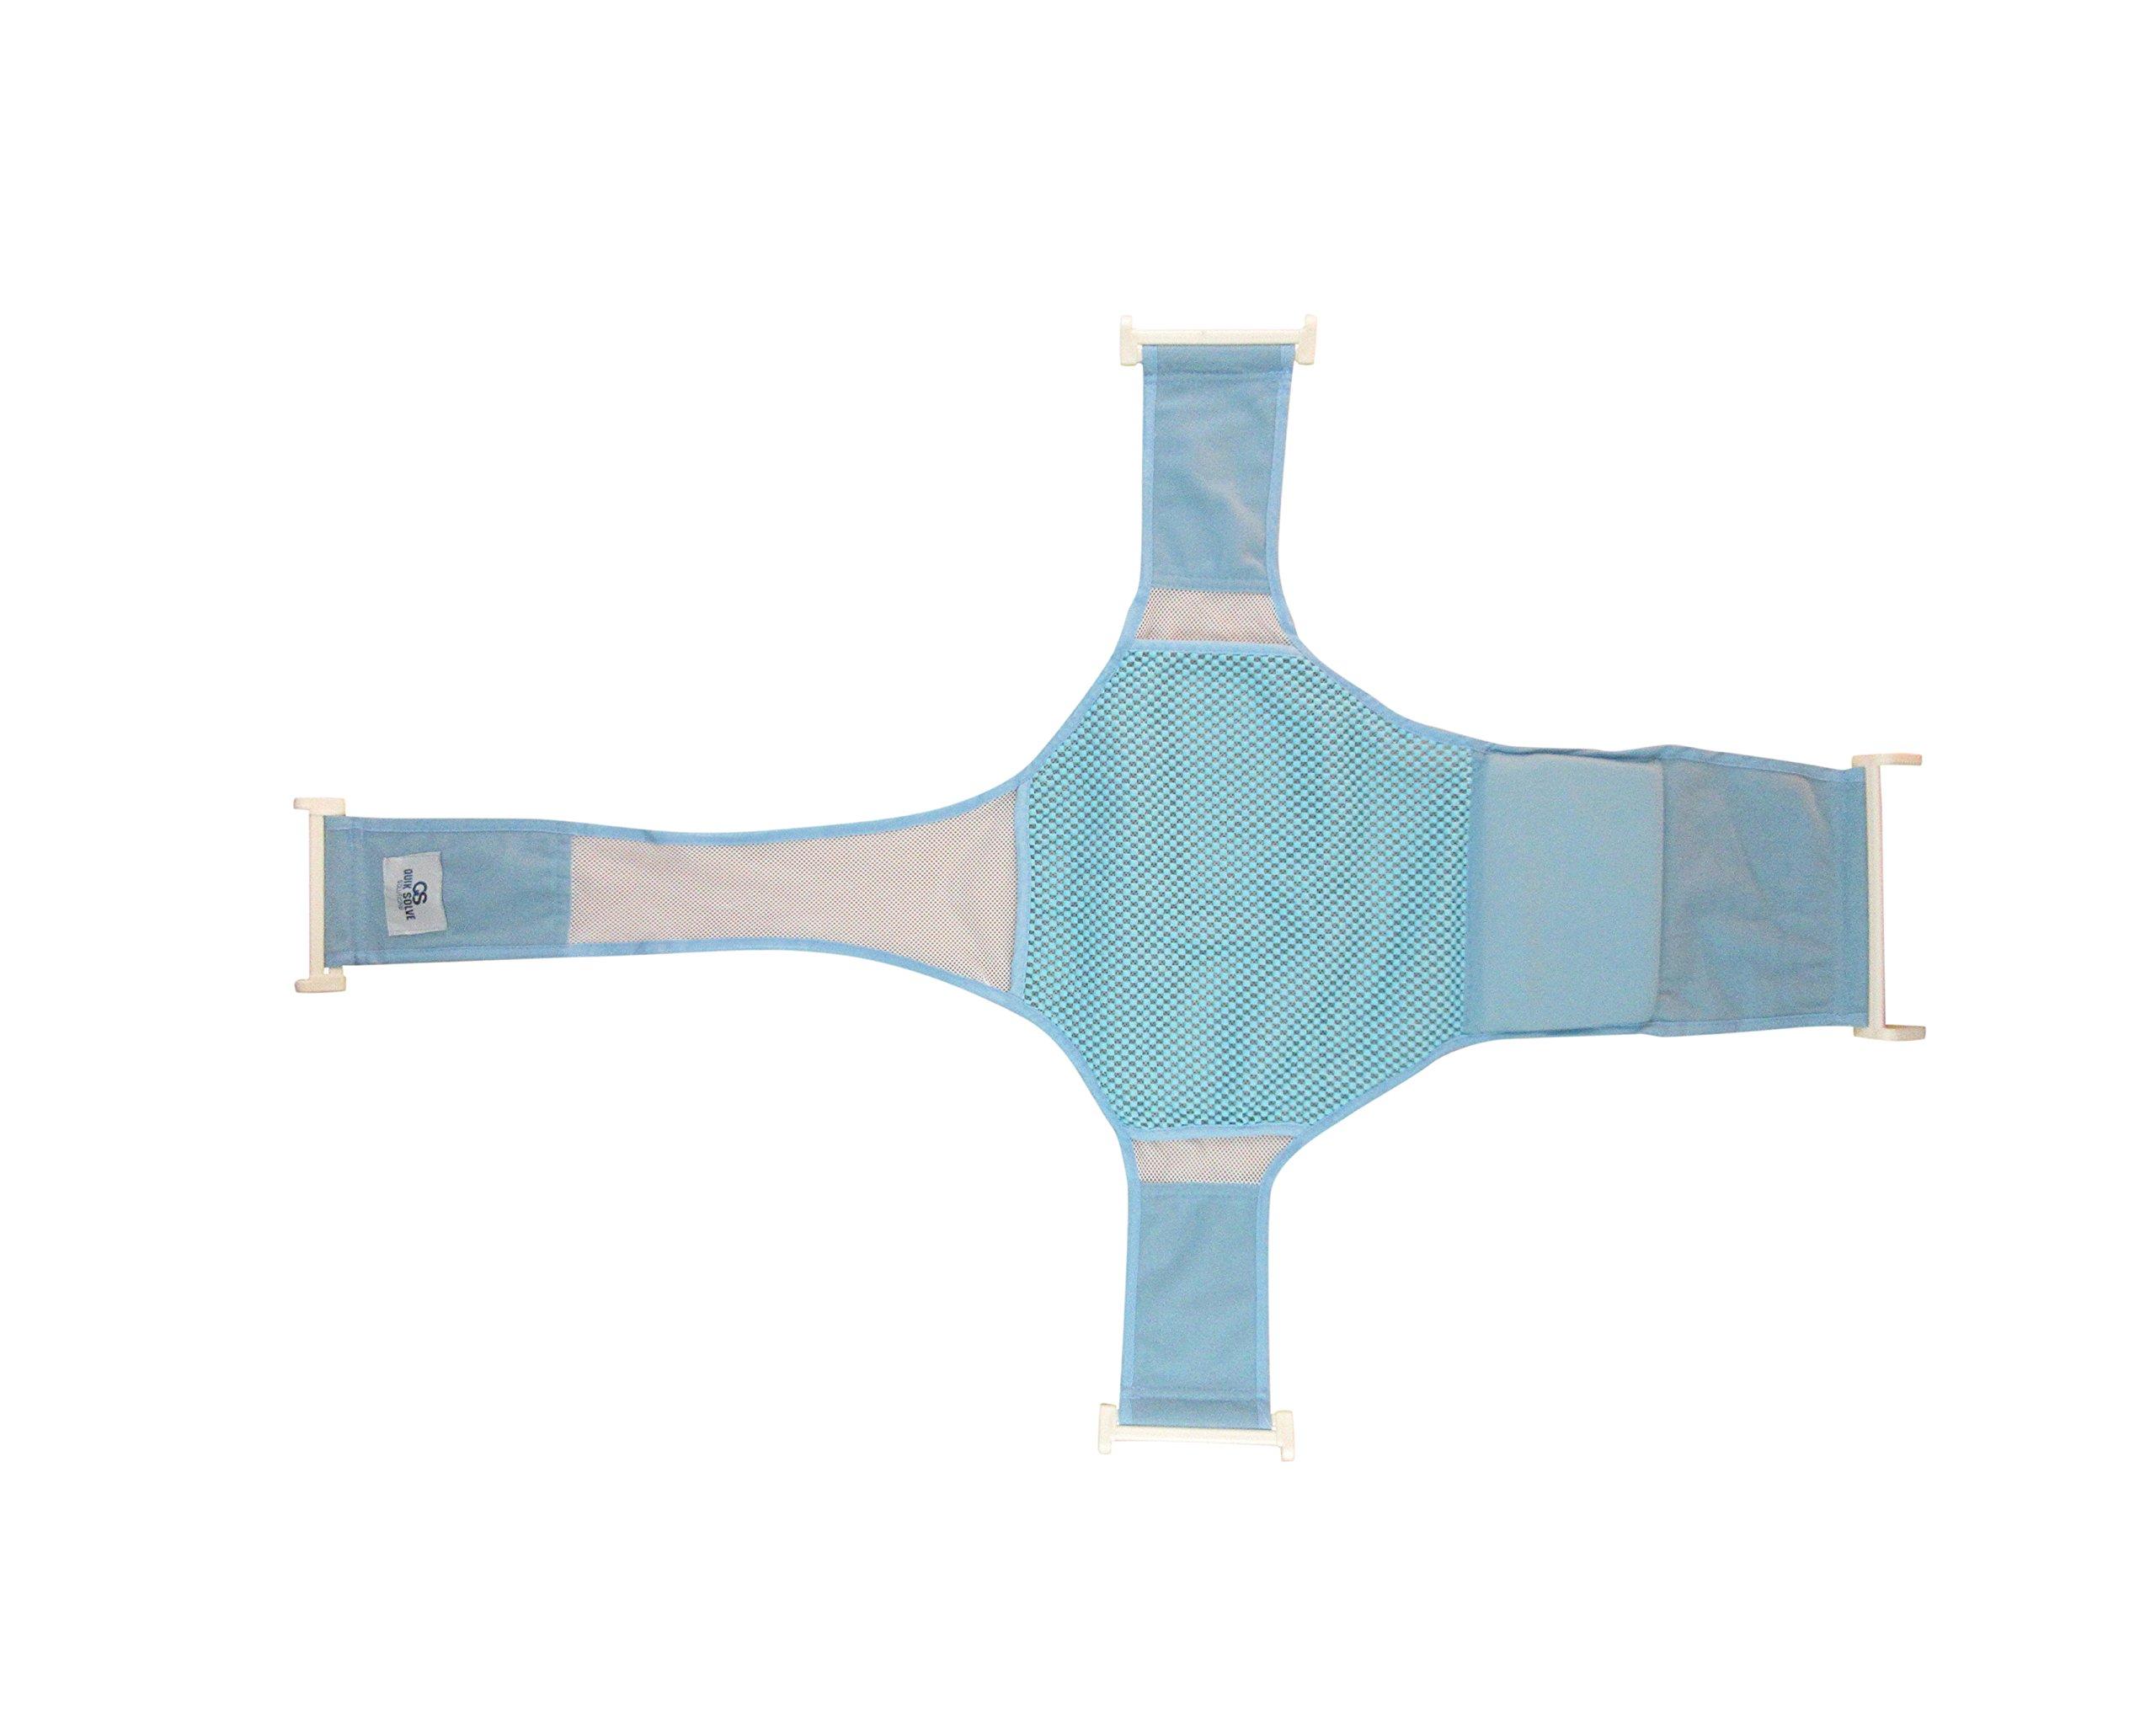 galleon baby bathtub seat support sling net karibu aojia. Black Bedroom Furniture Sets. Home Design Ideas